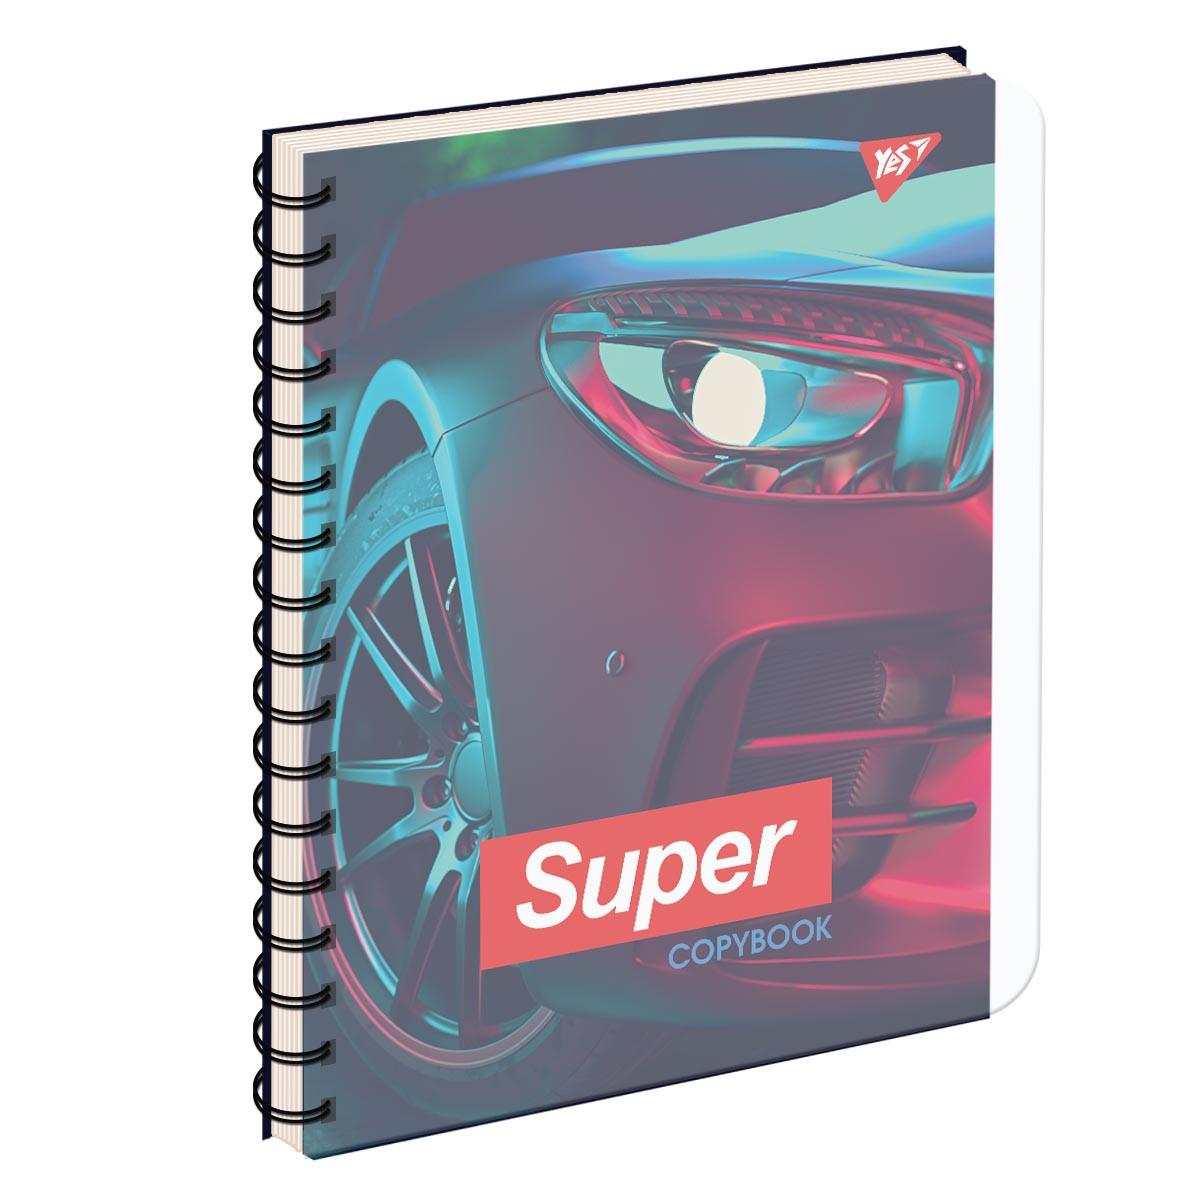 Тетрадь для записей А5/144 пл.обл. SUPER CAR YES код: 681660